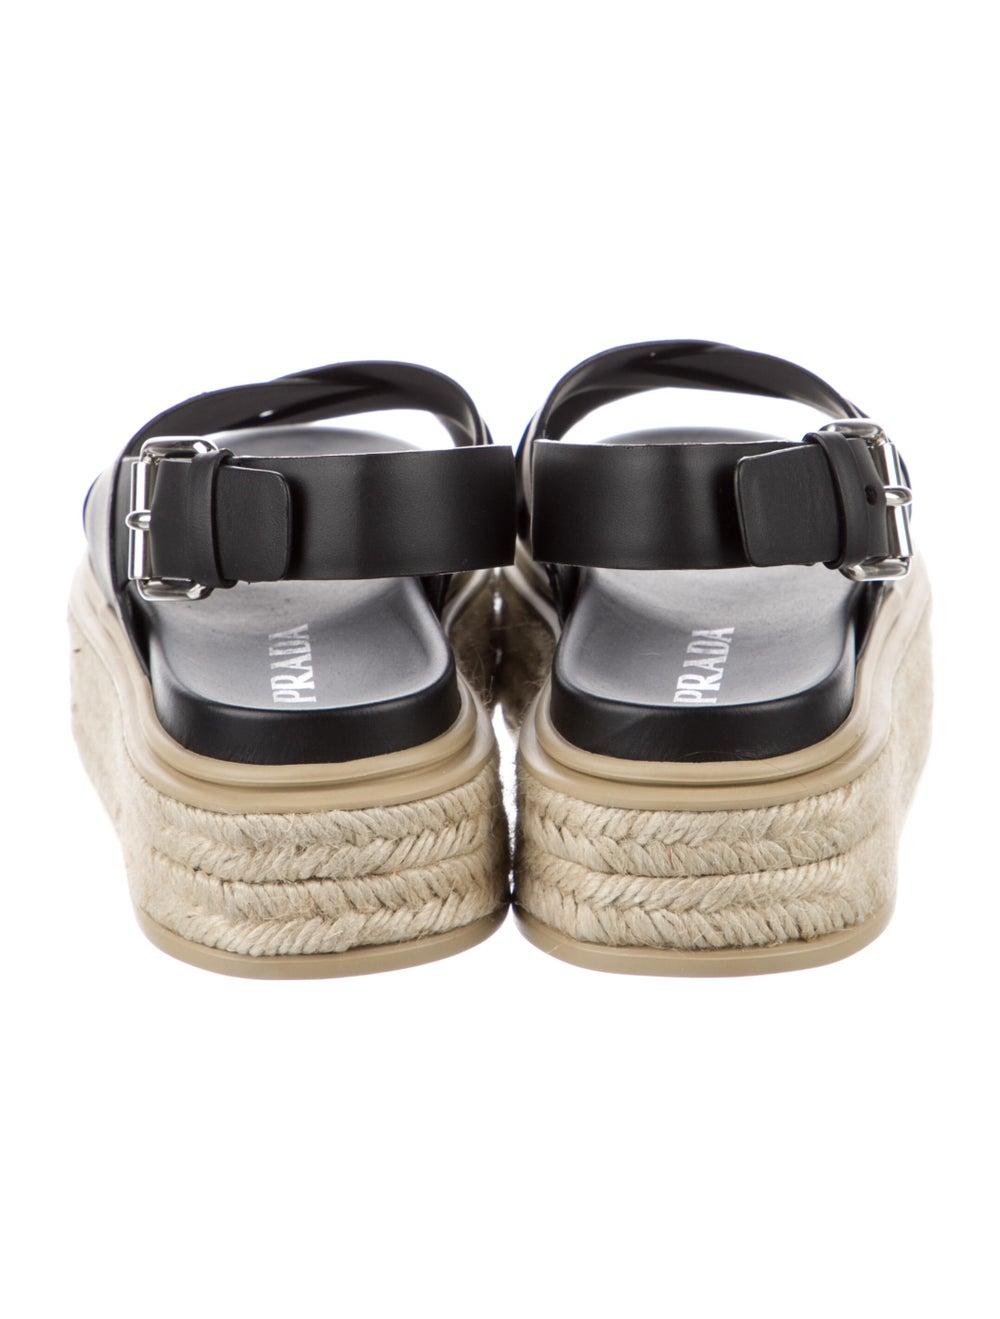 Prada Sport Leather Espadrilles Black - image 4